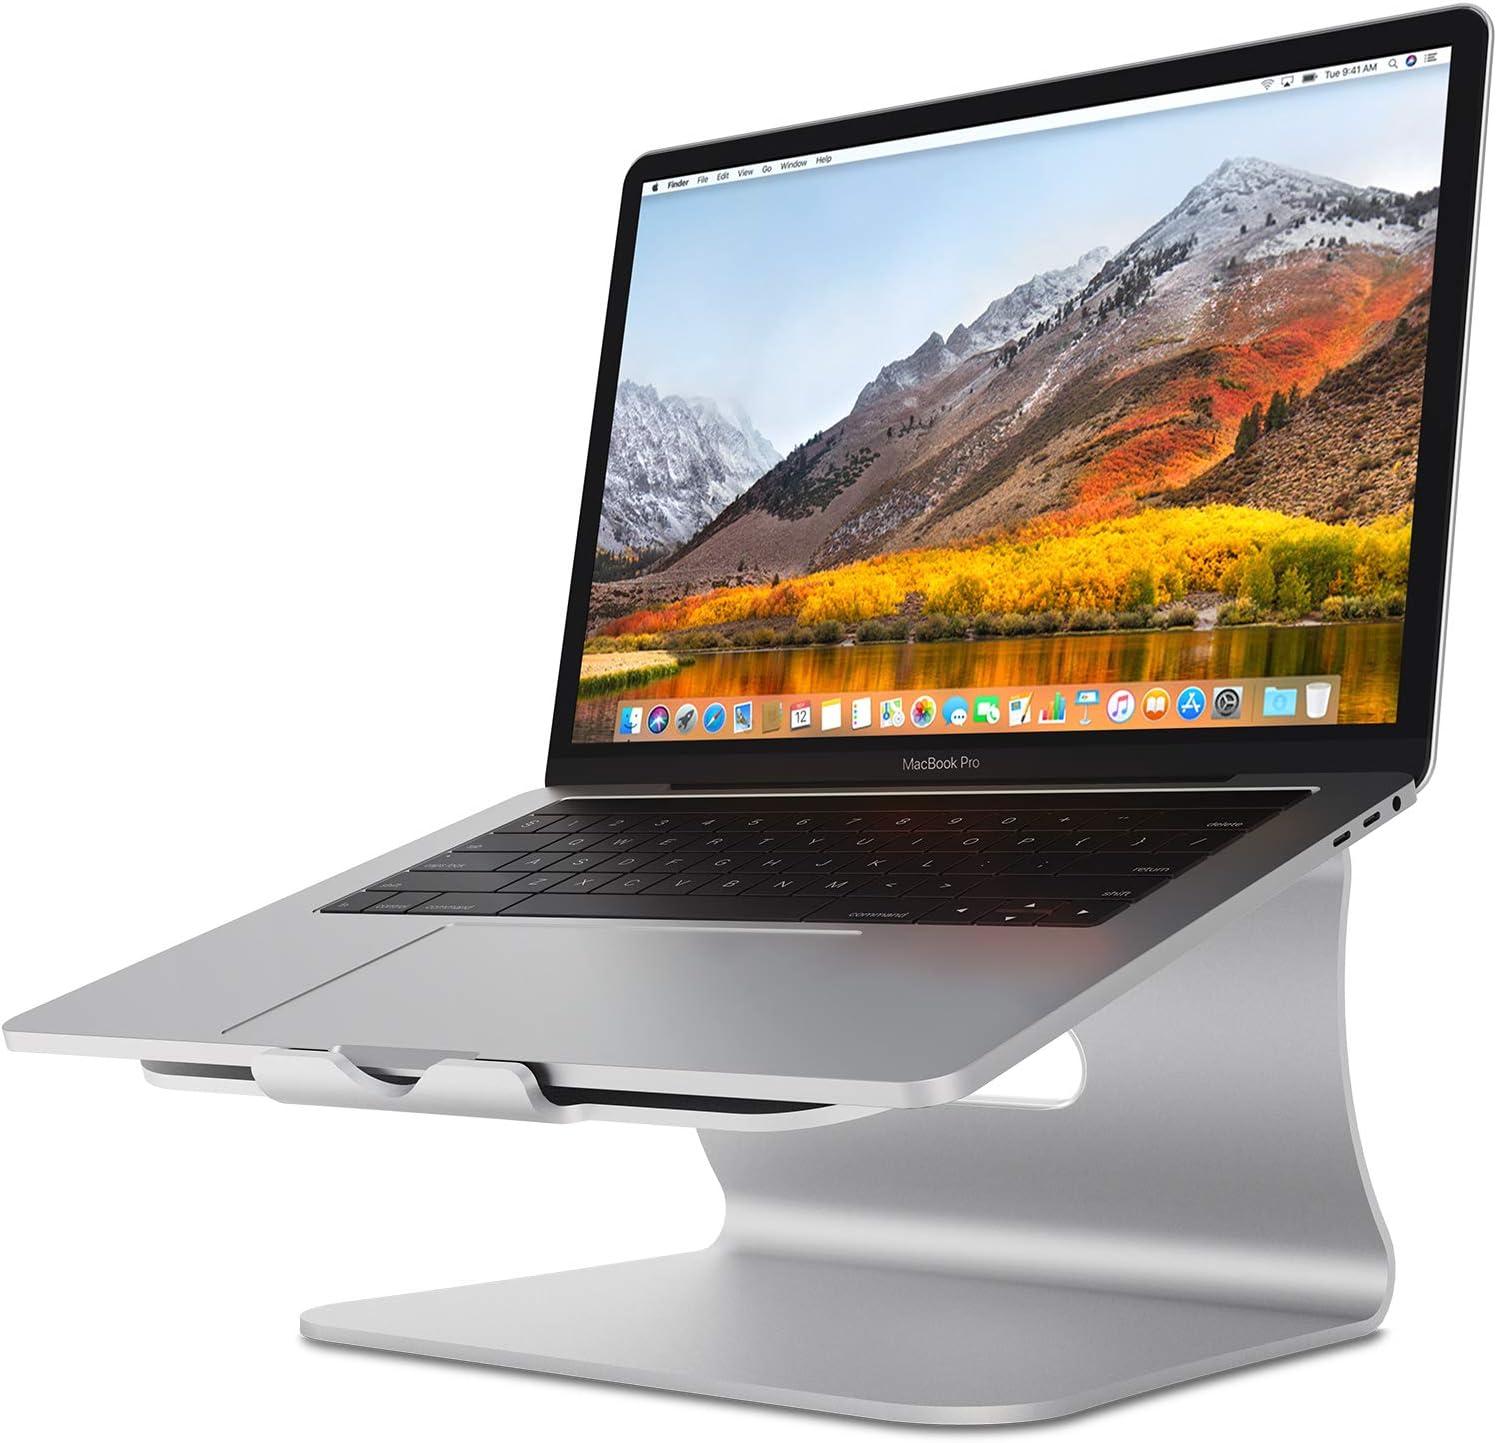 Soporte Para Laptop De Aluminio Stand plateado Bestand